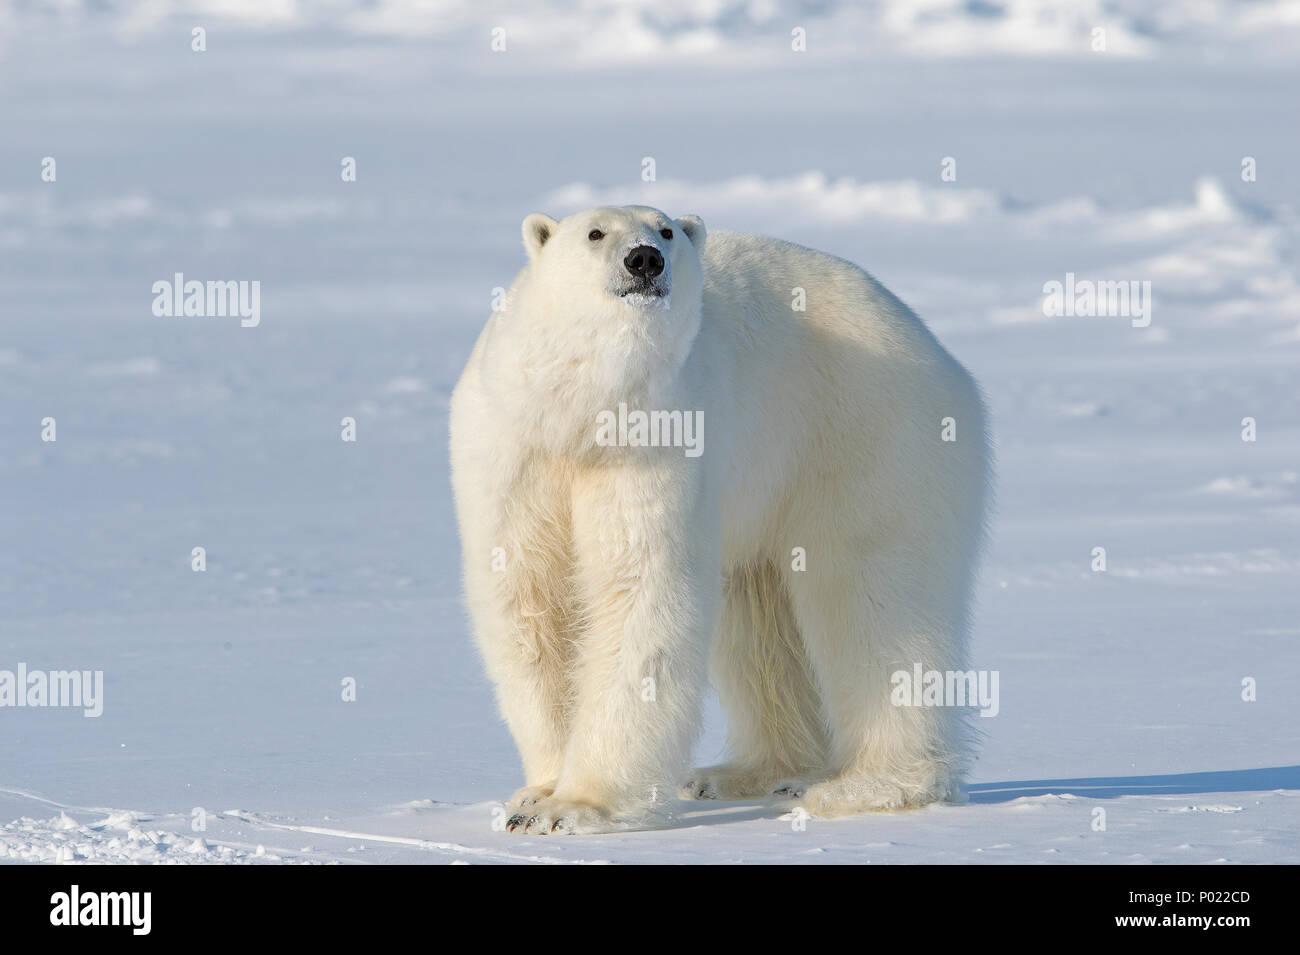 Polar Bear (Ursus maritimus, synonym Thalarctos maritimus), Nunavut Territory, Canada Stock Photo